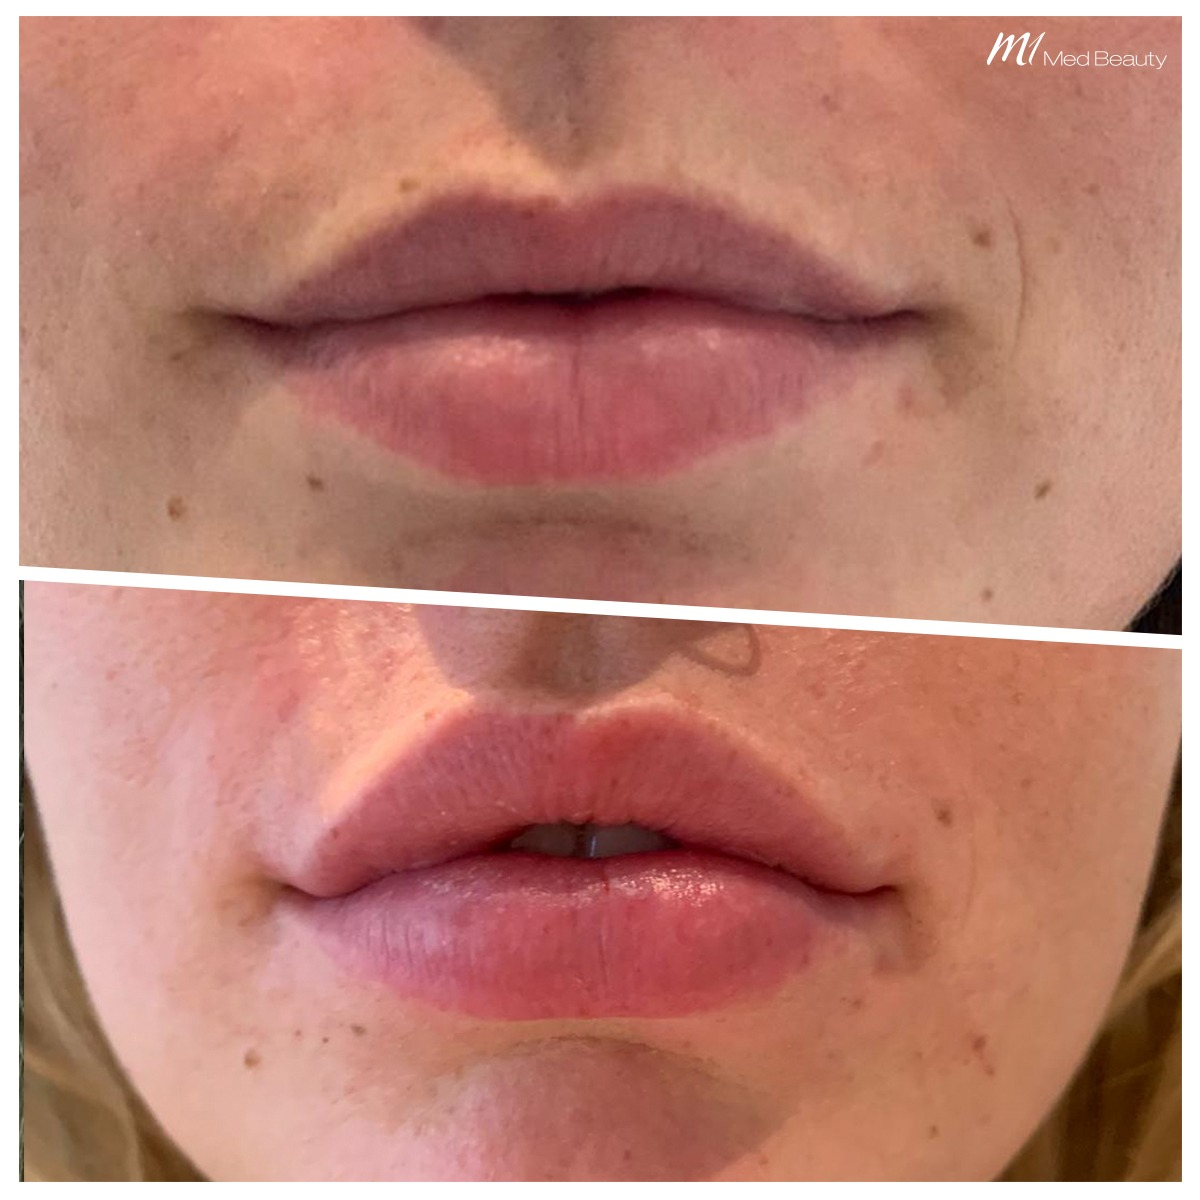 lip-fillers-200527_BA5.jpg